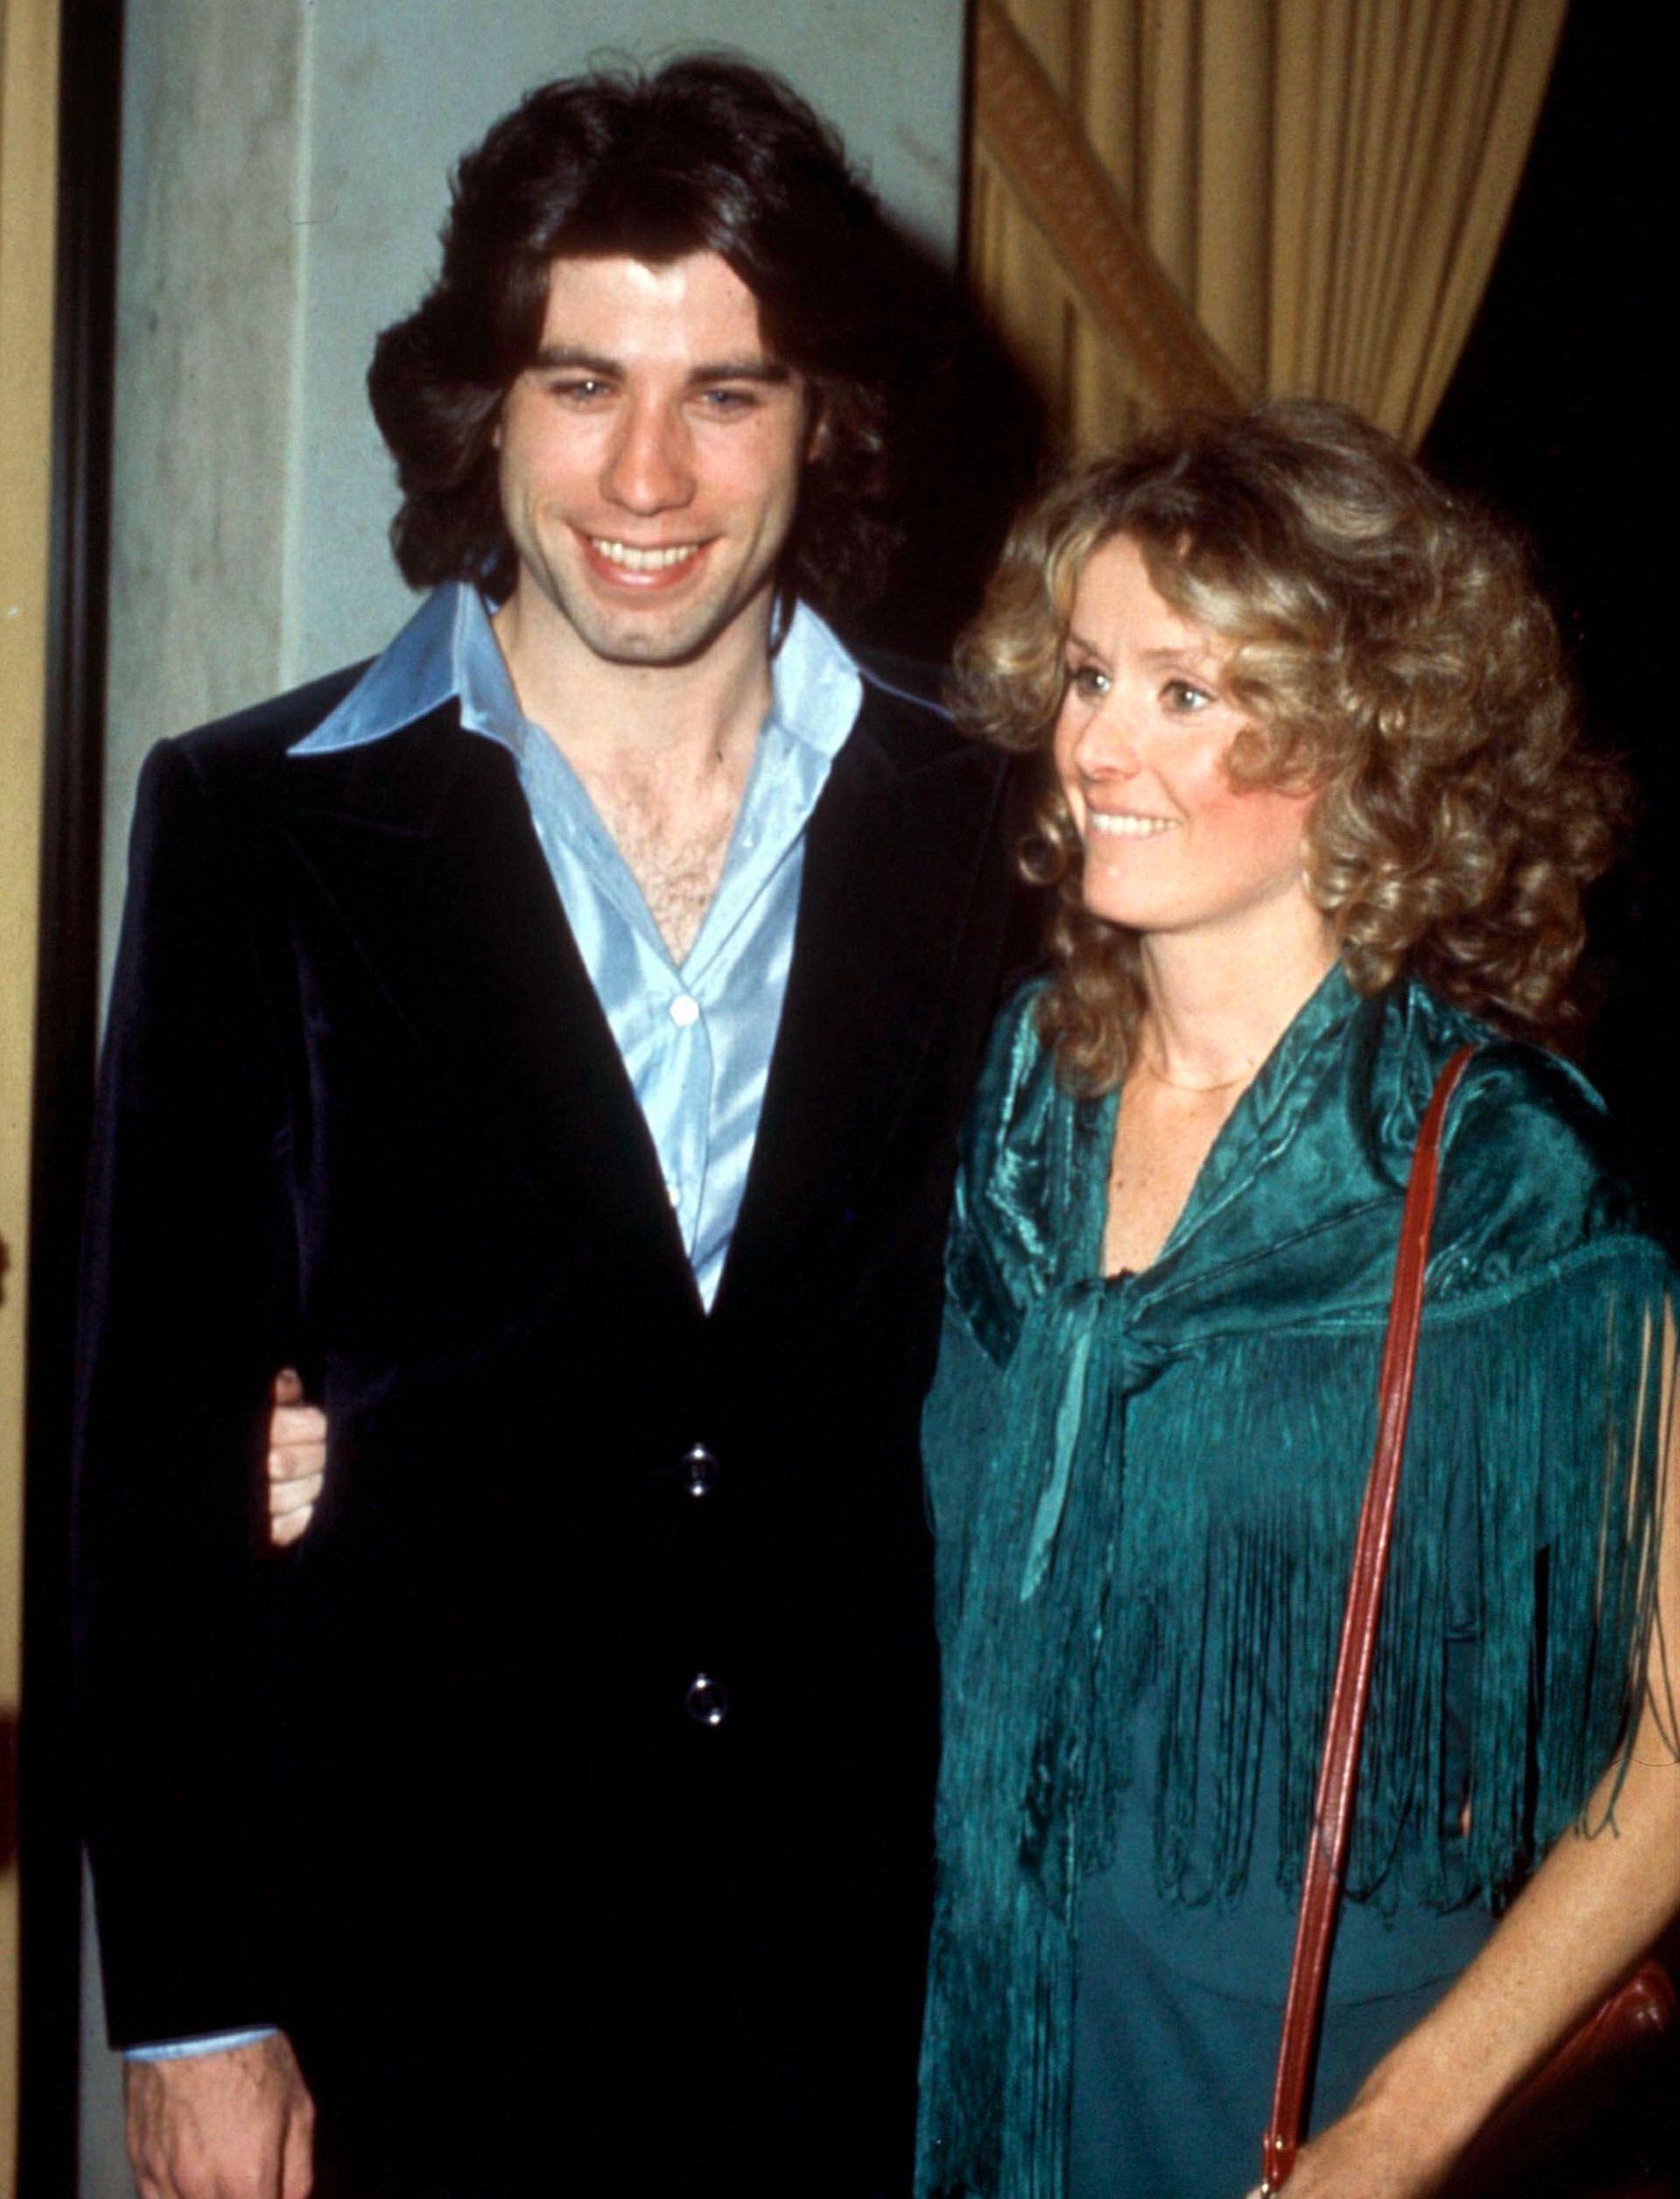 John Travolta y y Diana Hyland. | Foto: Shutterstock